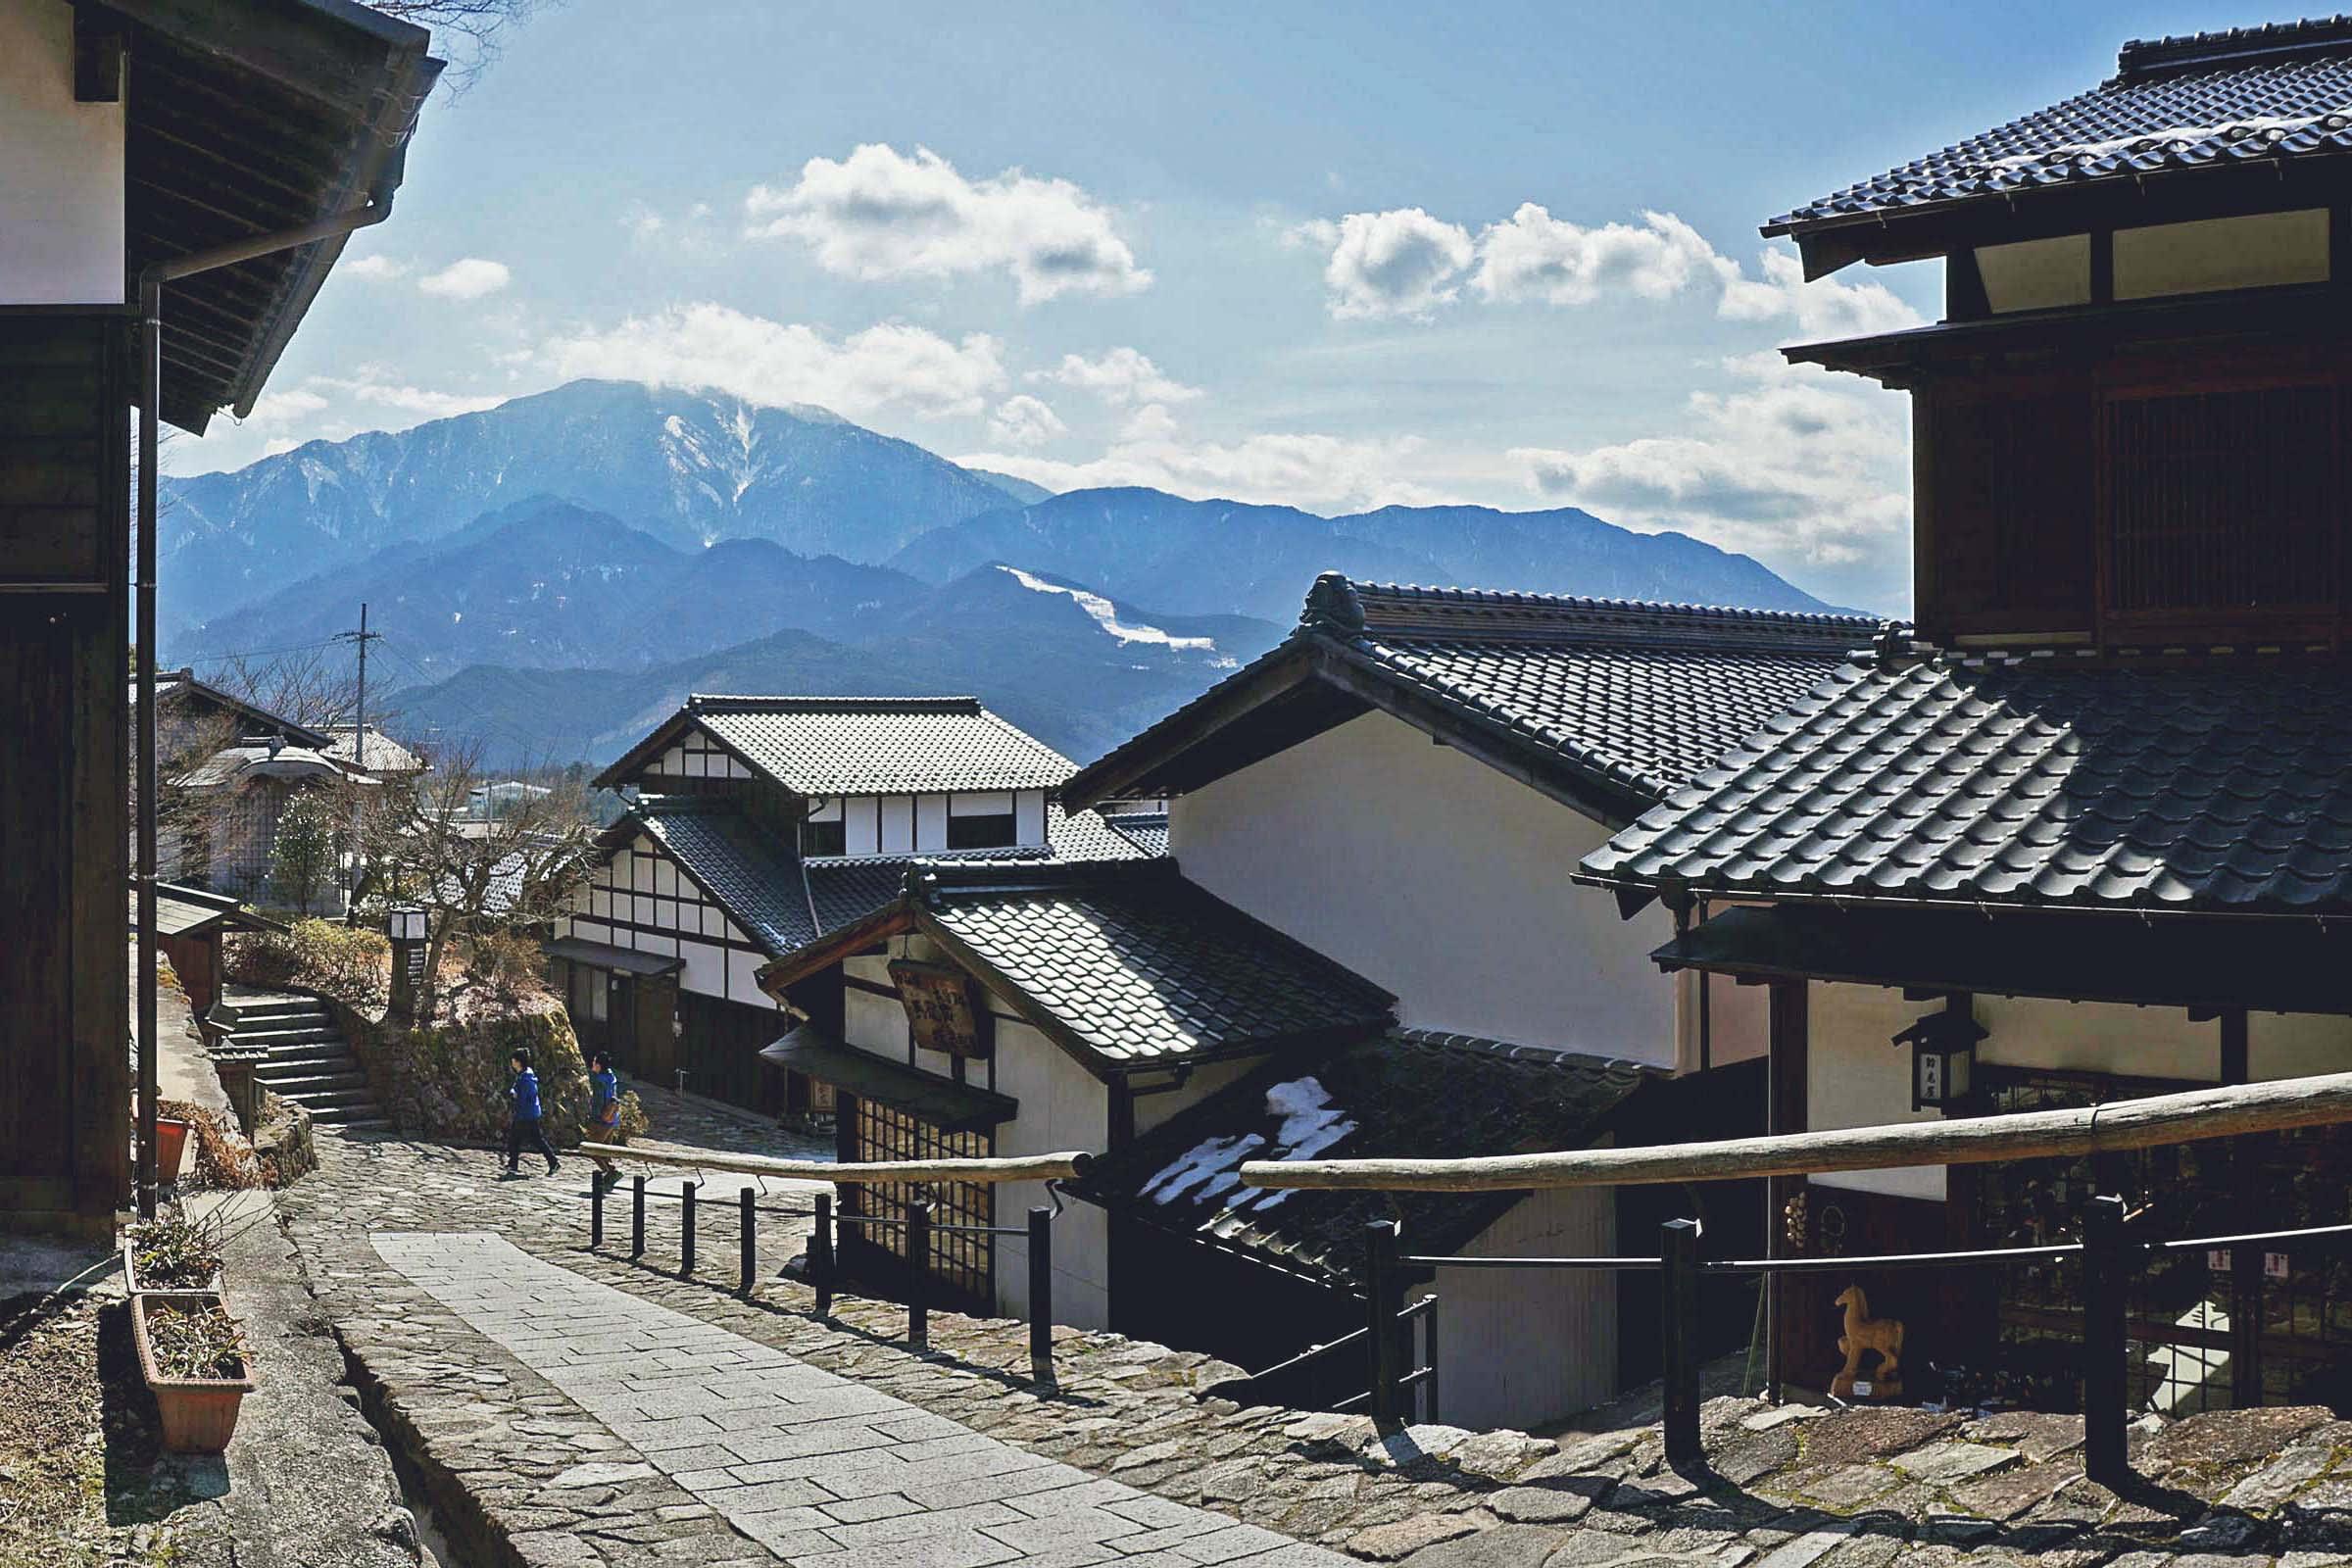 Magome jukupost town 馬籠宿 panoramio 35